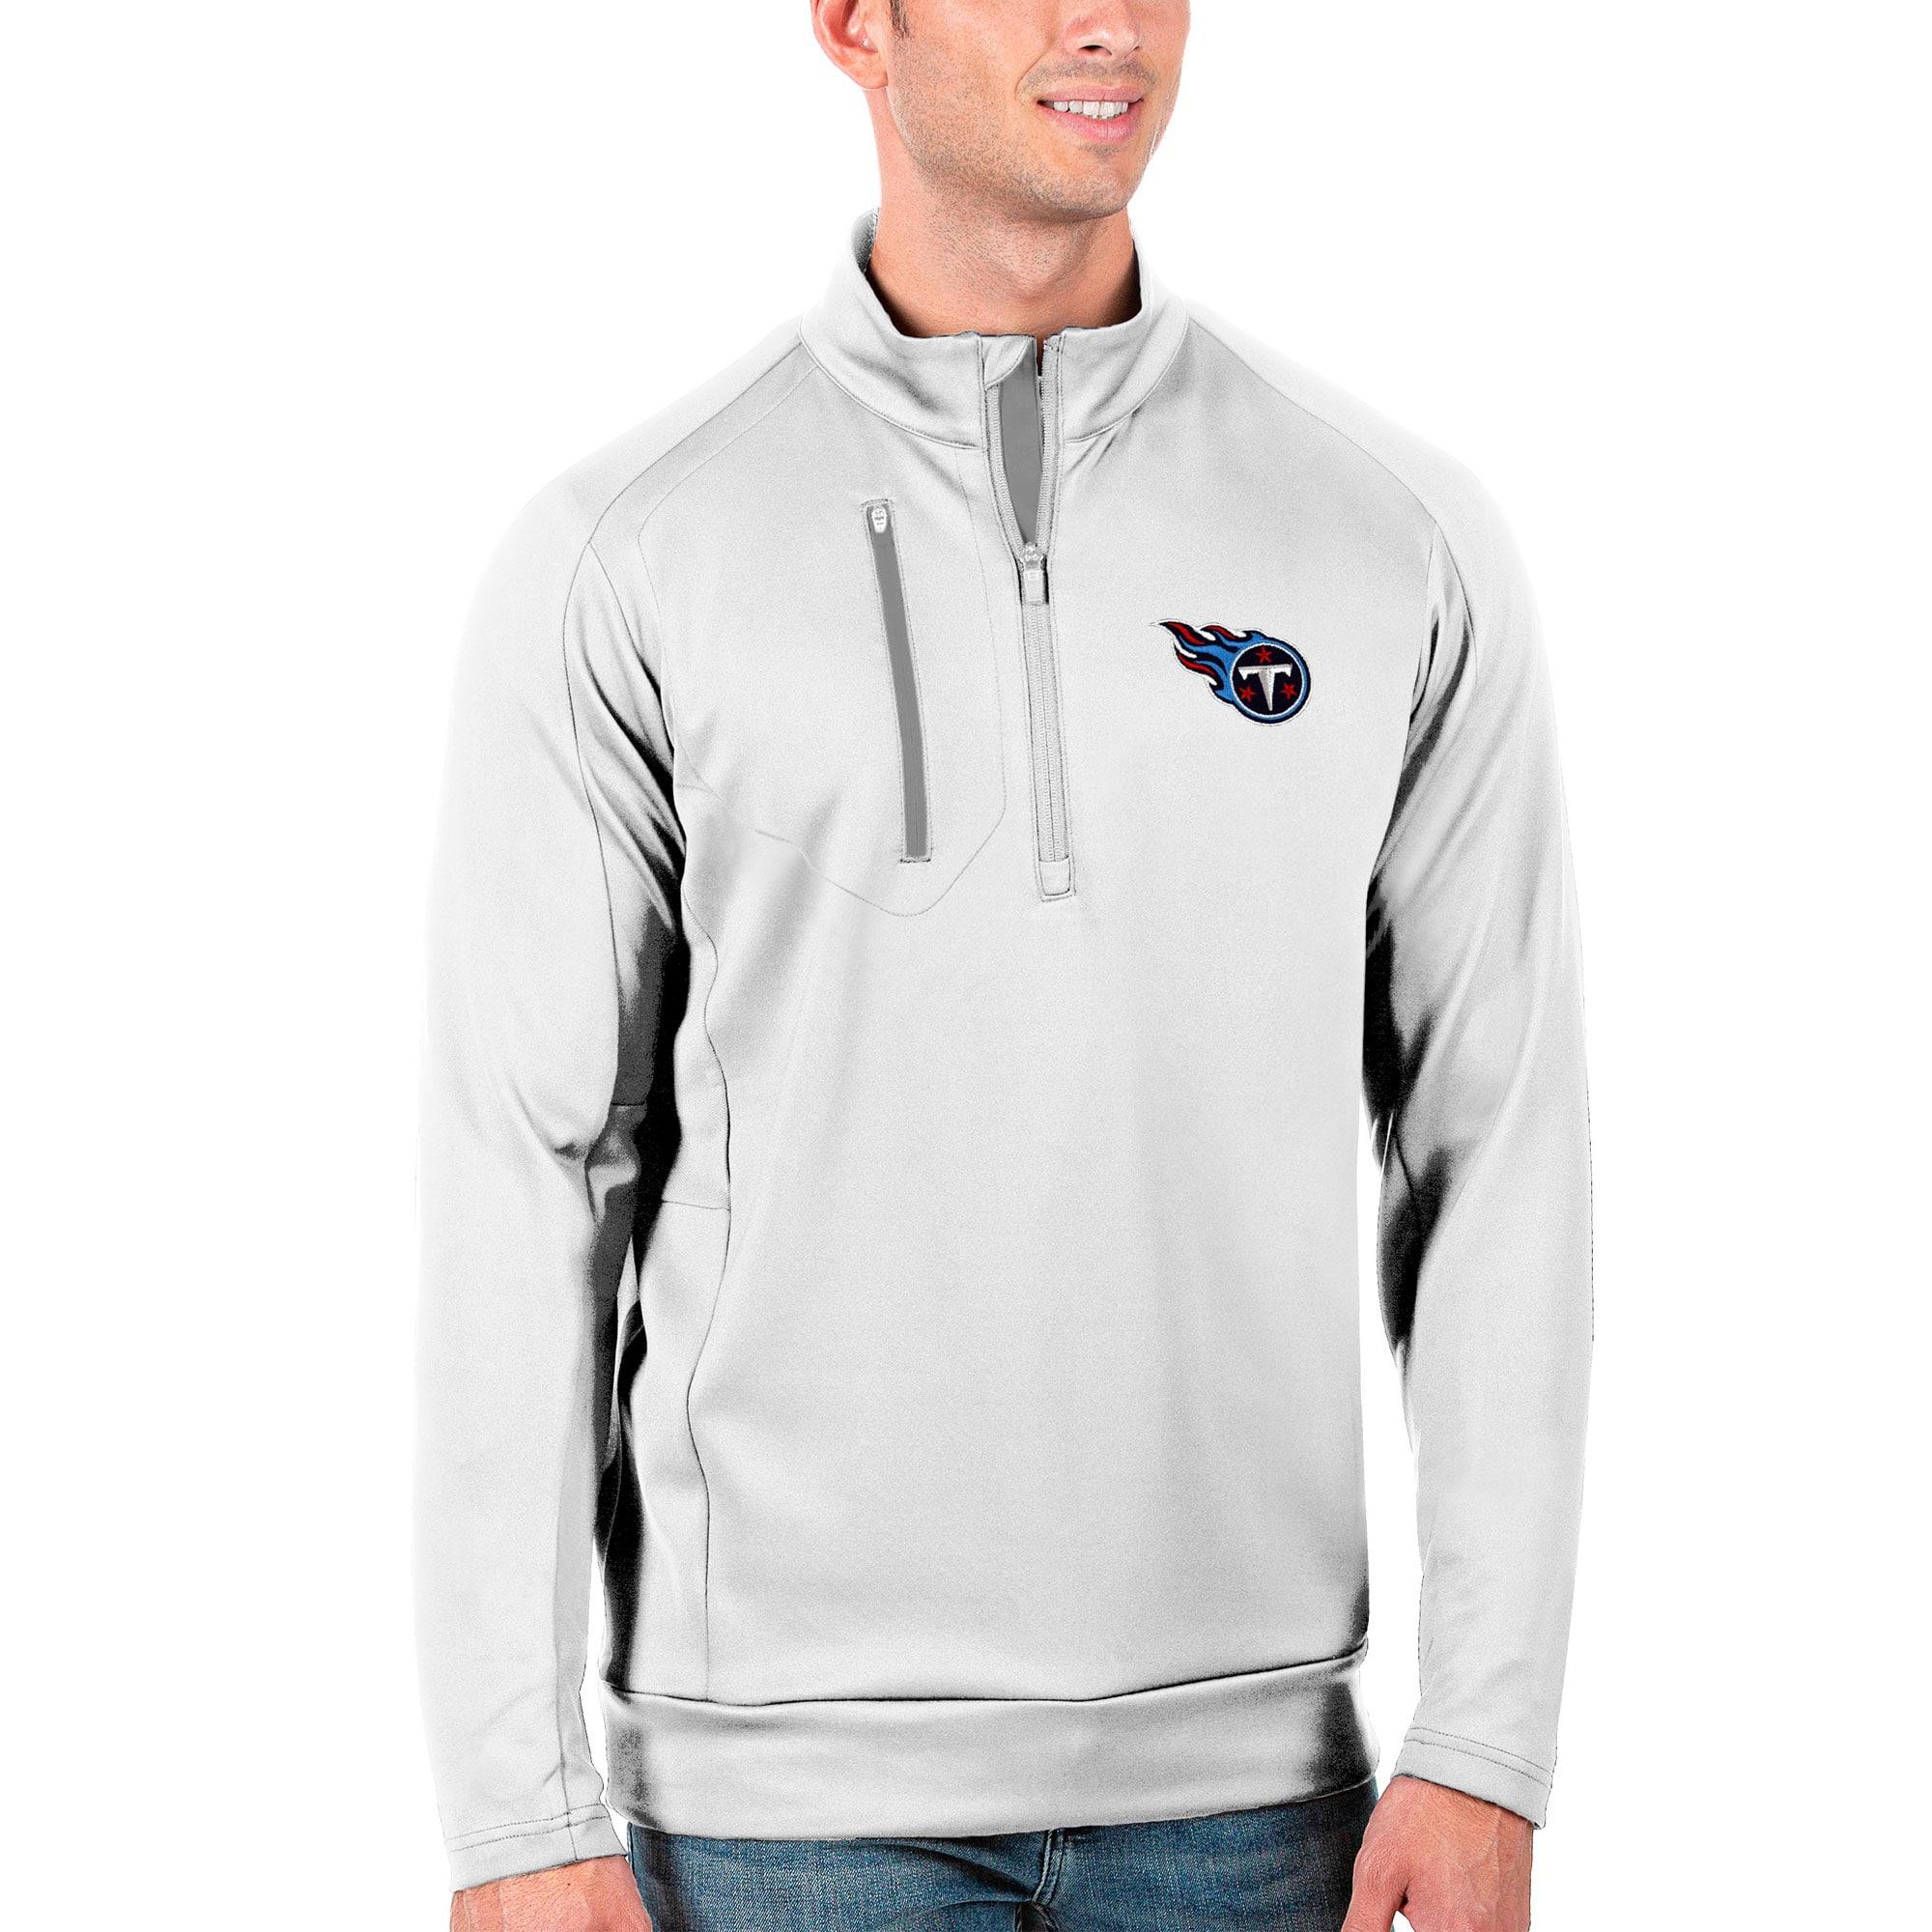 Tennessee Titans Antigua Generation Quarter-Zip Pullover Jacket - White/Silver